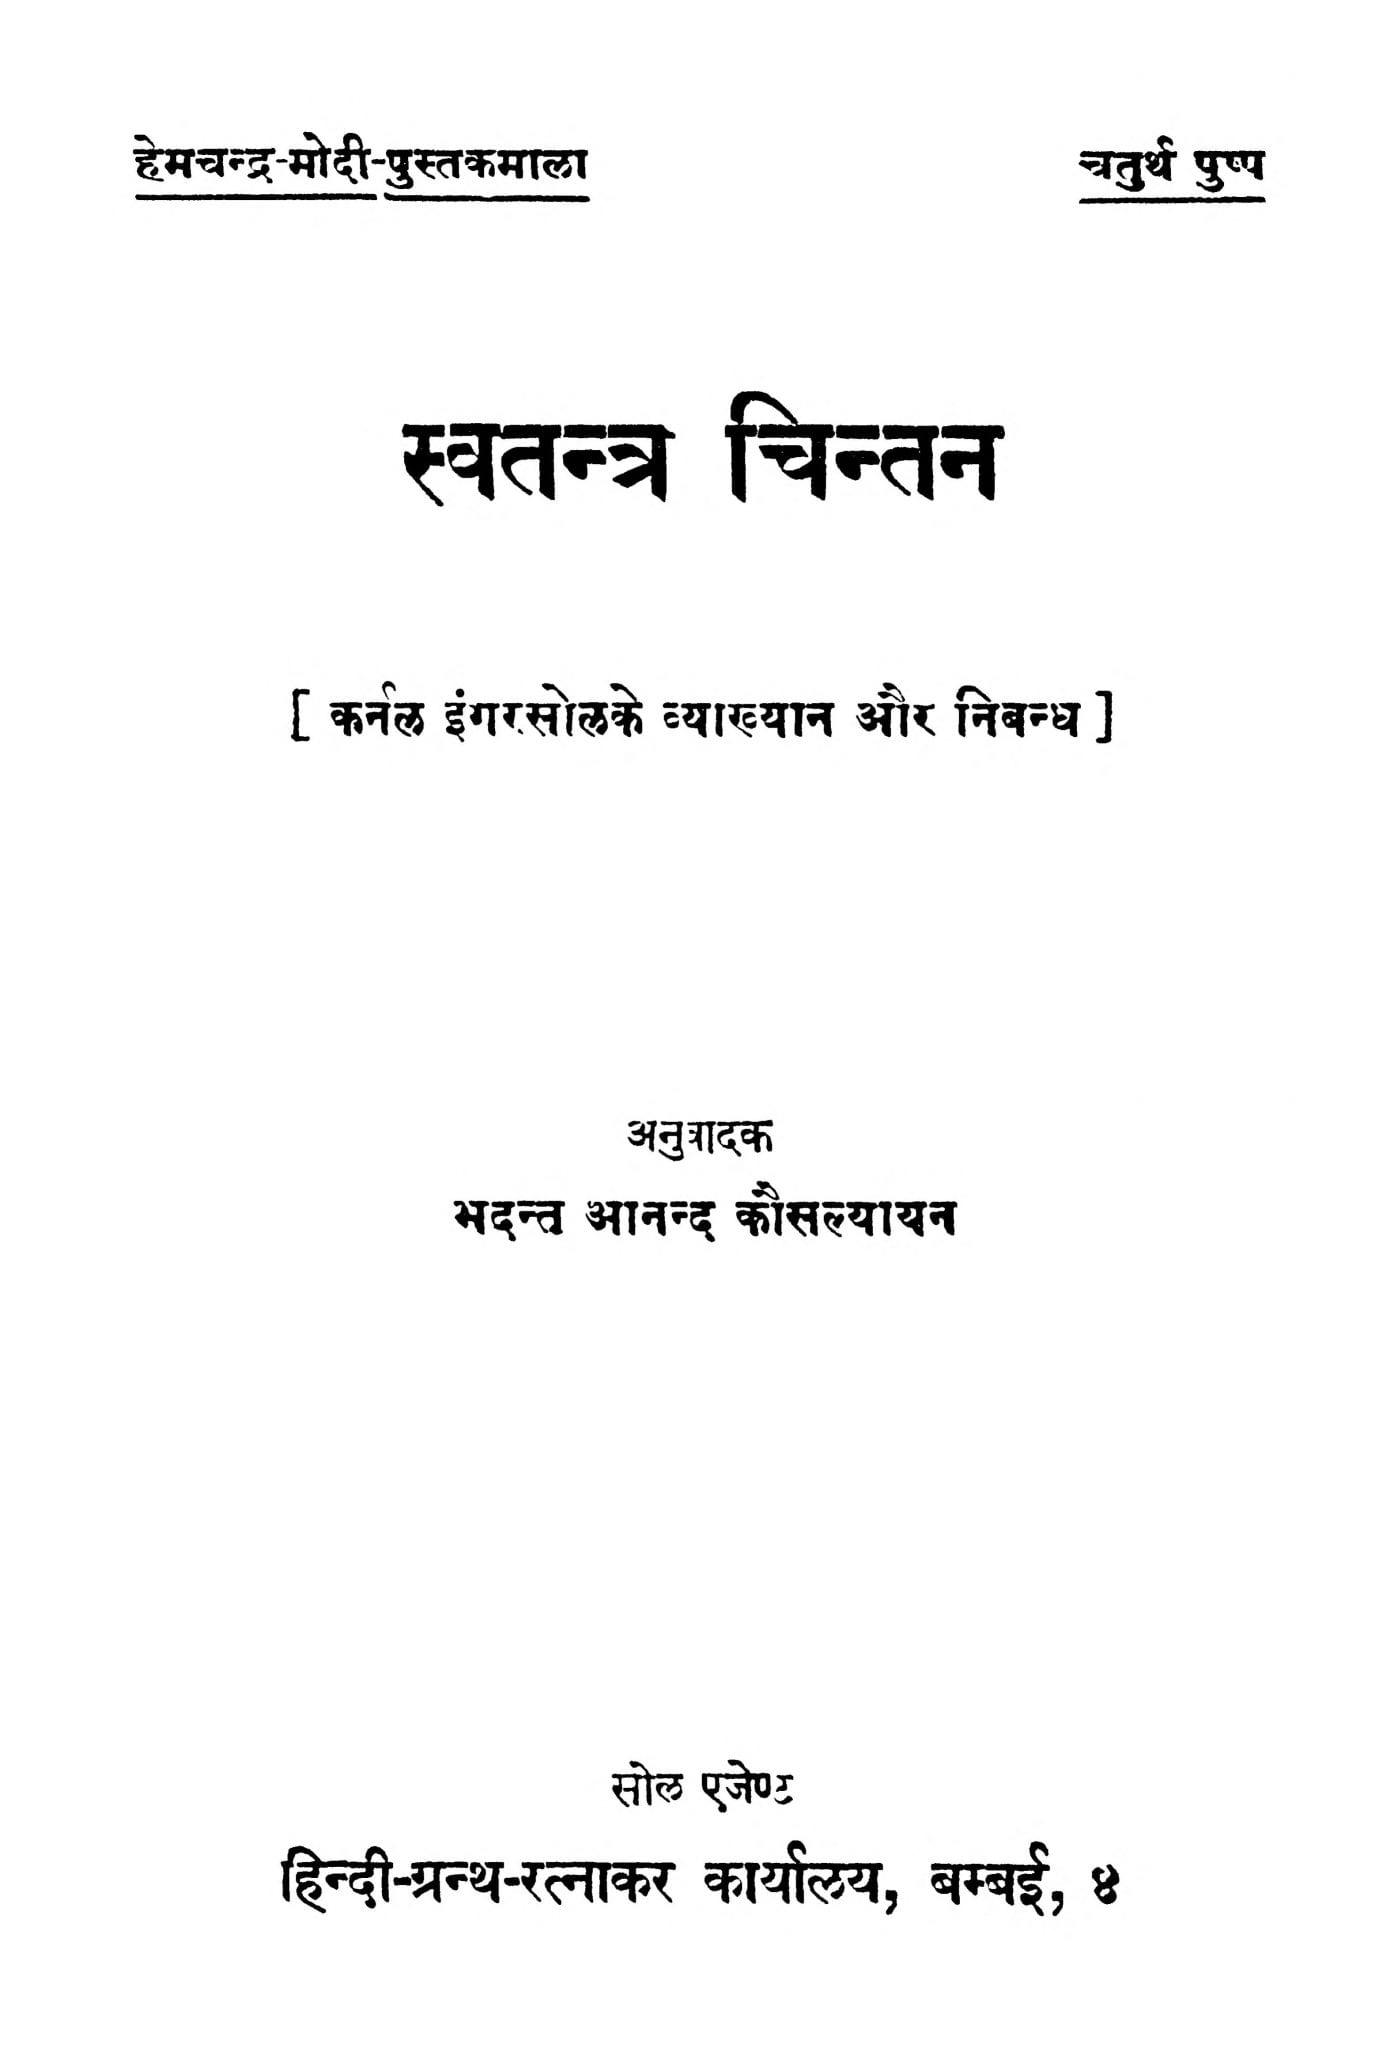 Svatantra Chintan by भदन्त आनन्द कौसल्यायन - Bhadant Anand Kausalyayan